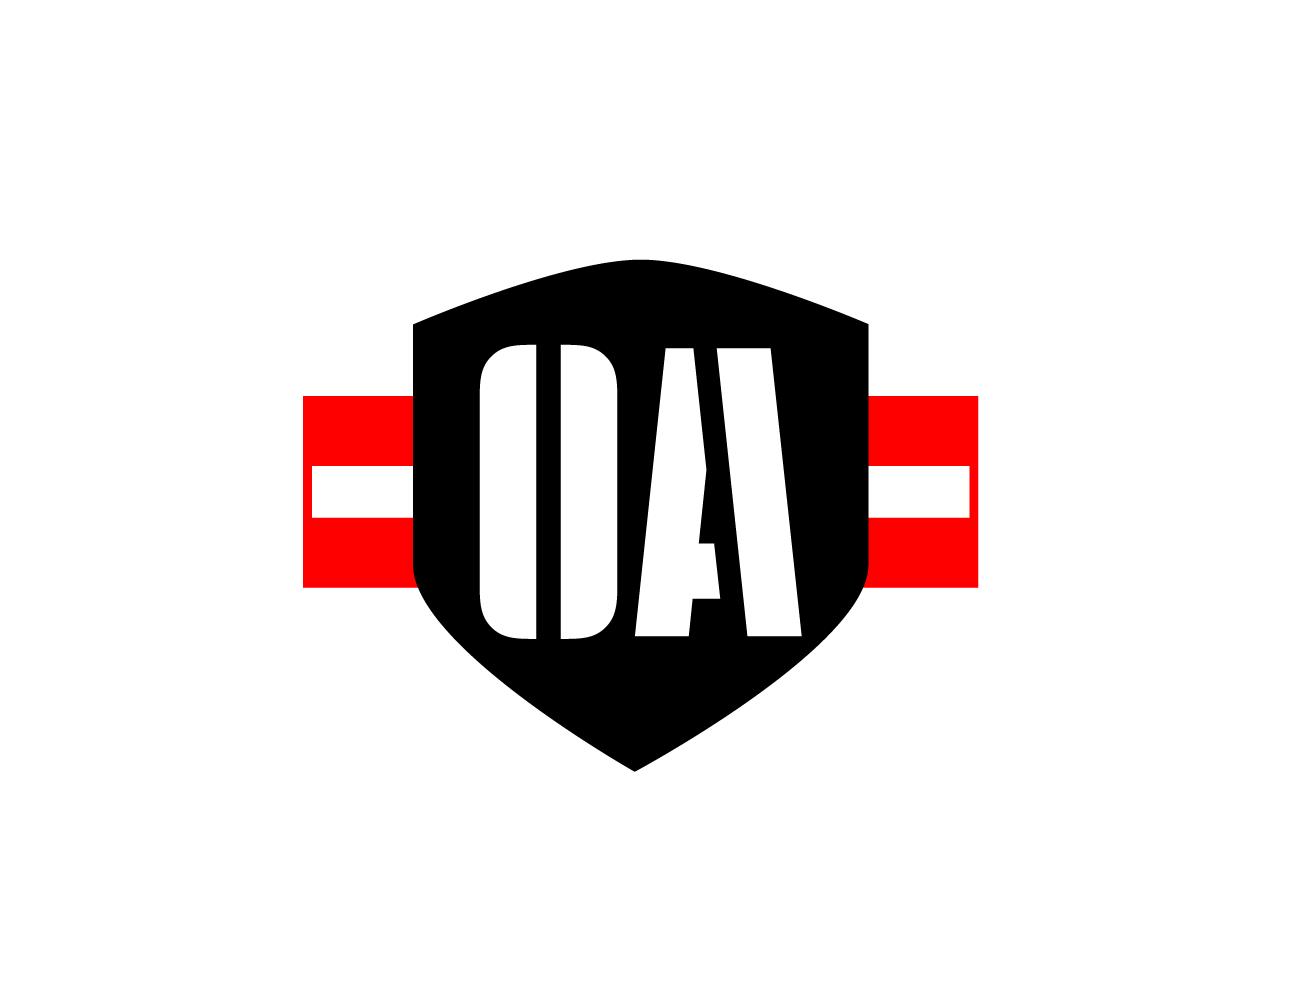 Fire-OA-advanced.png